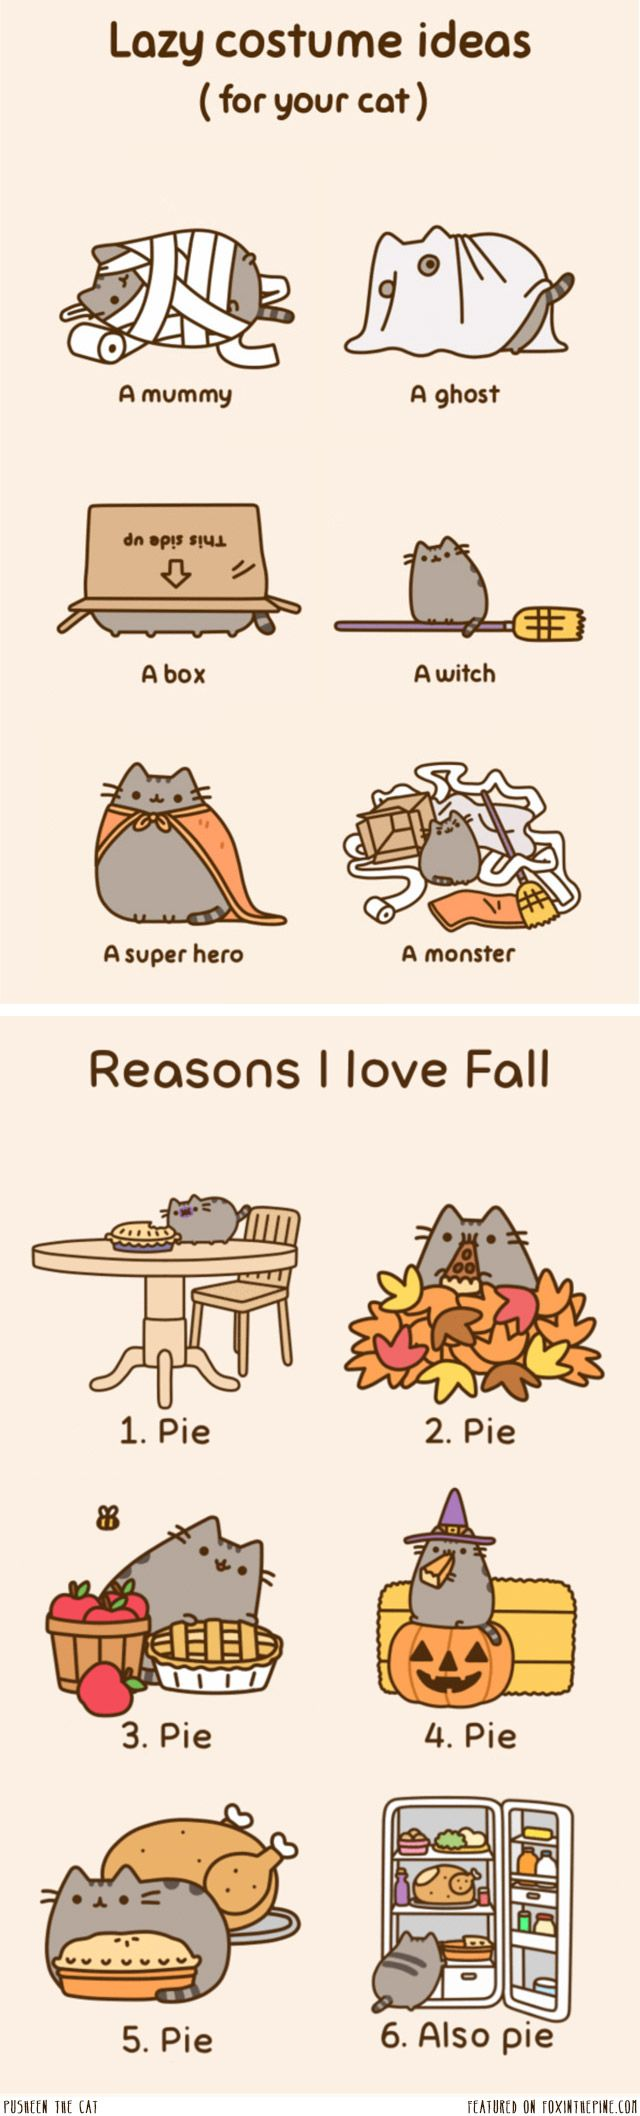 Pusheen loves fall